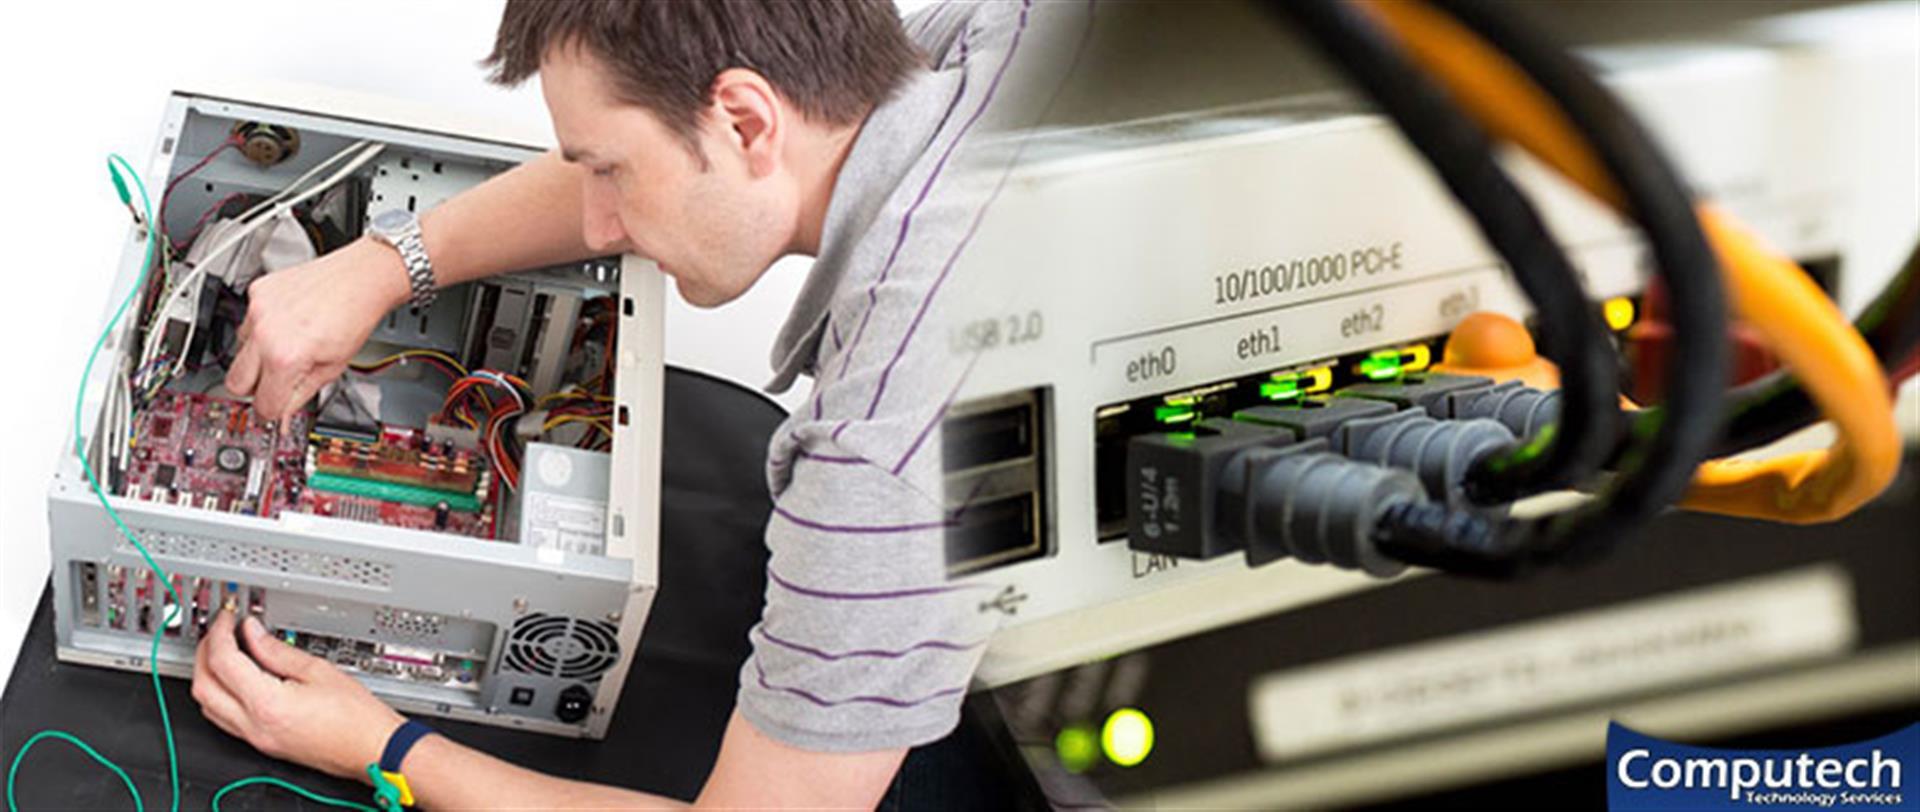 Vinton Virginia On Site PC & Printer Repair, Networks, Voice & Data Cabling Solutions